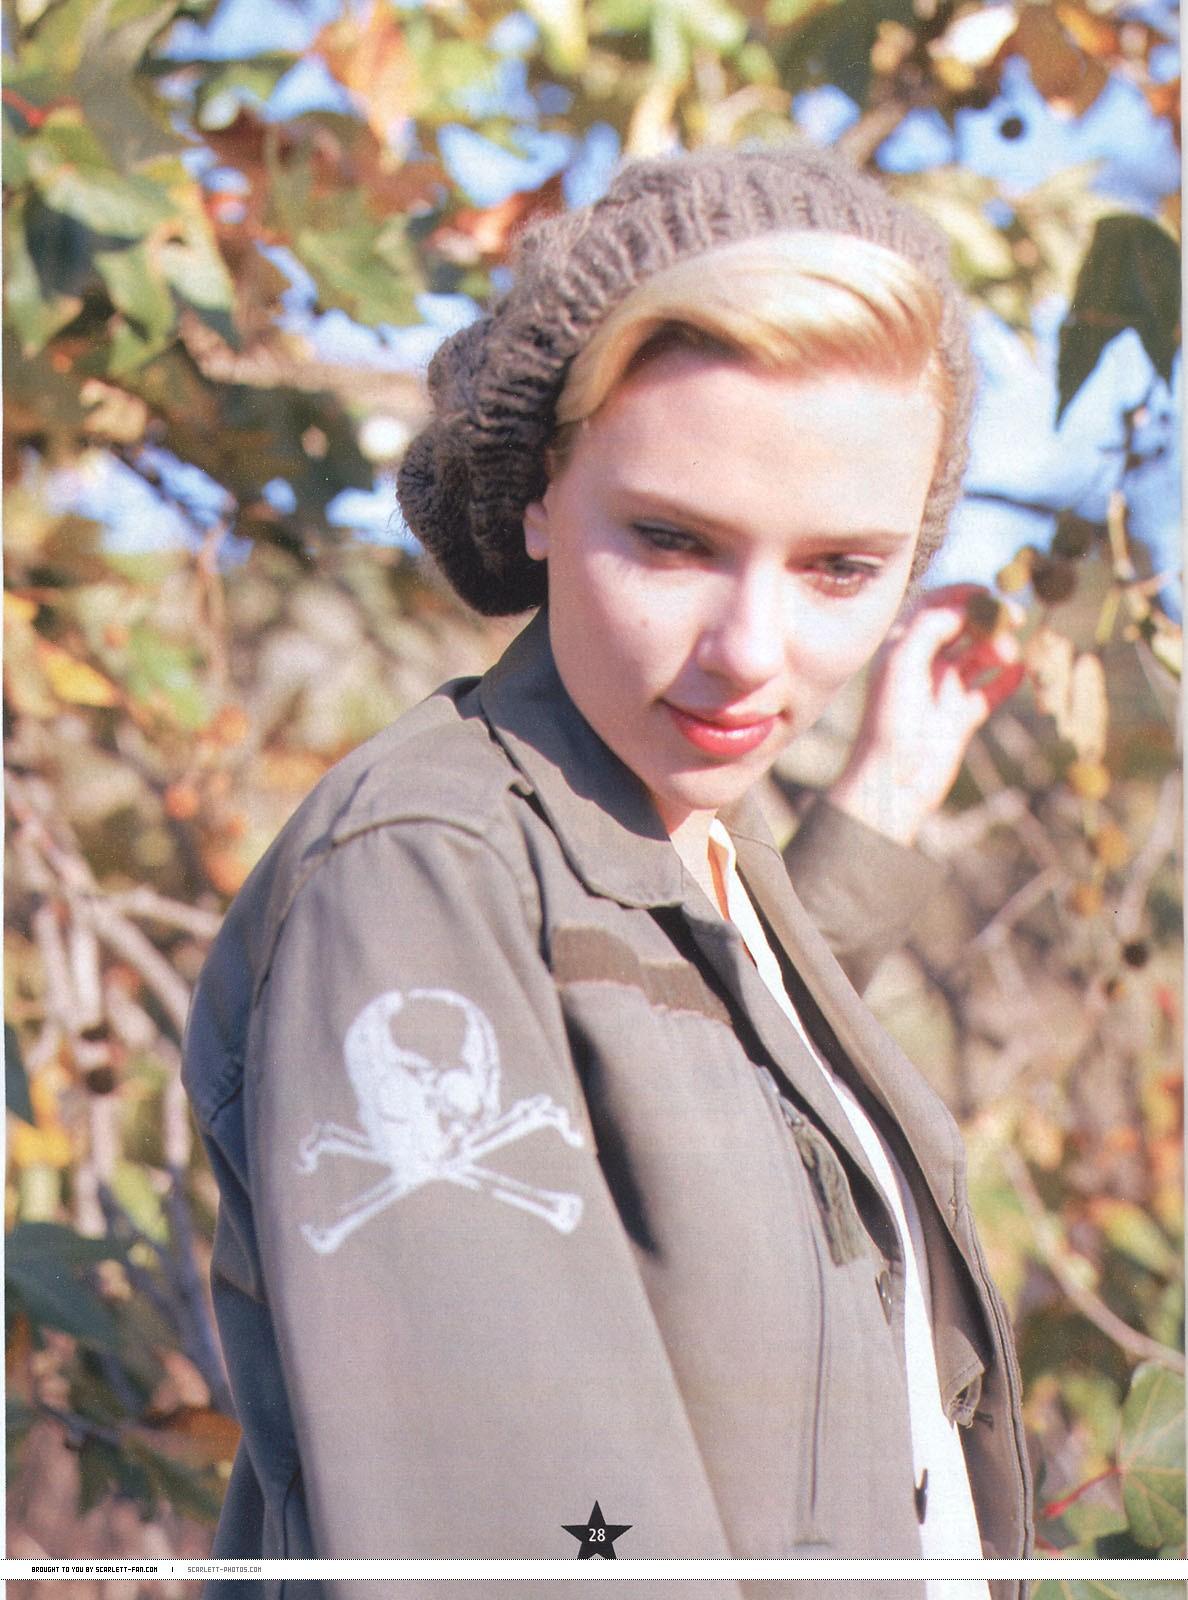 http://3.bp.blogspot.com/_YzoNgr0eLEo/TU5hL--vEnI/AAAAAAAAHqw/A1GuGZcukV0/s1600/27146_Scarlett_Johansson_-_Celebrity_magazine_528_122_534lo.jpg